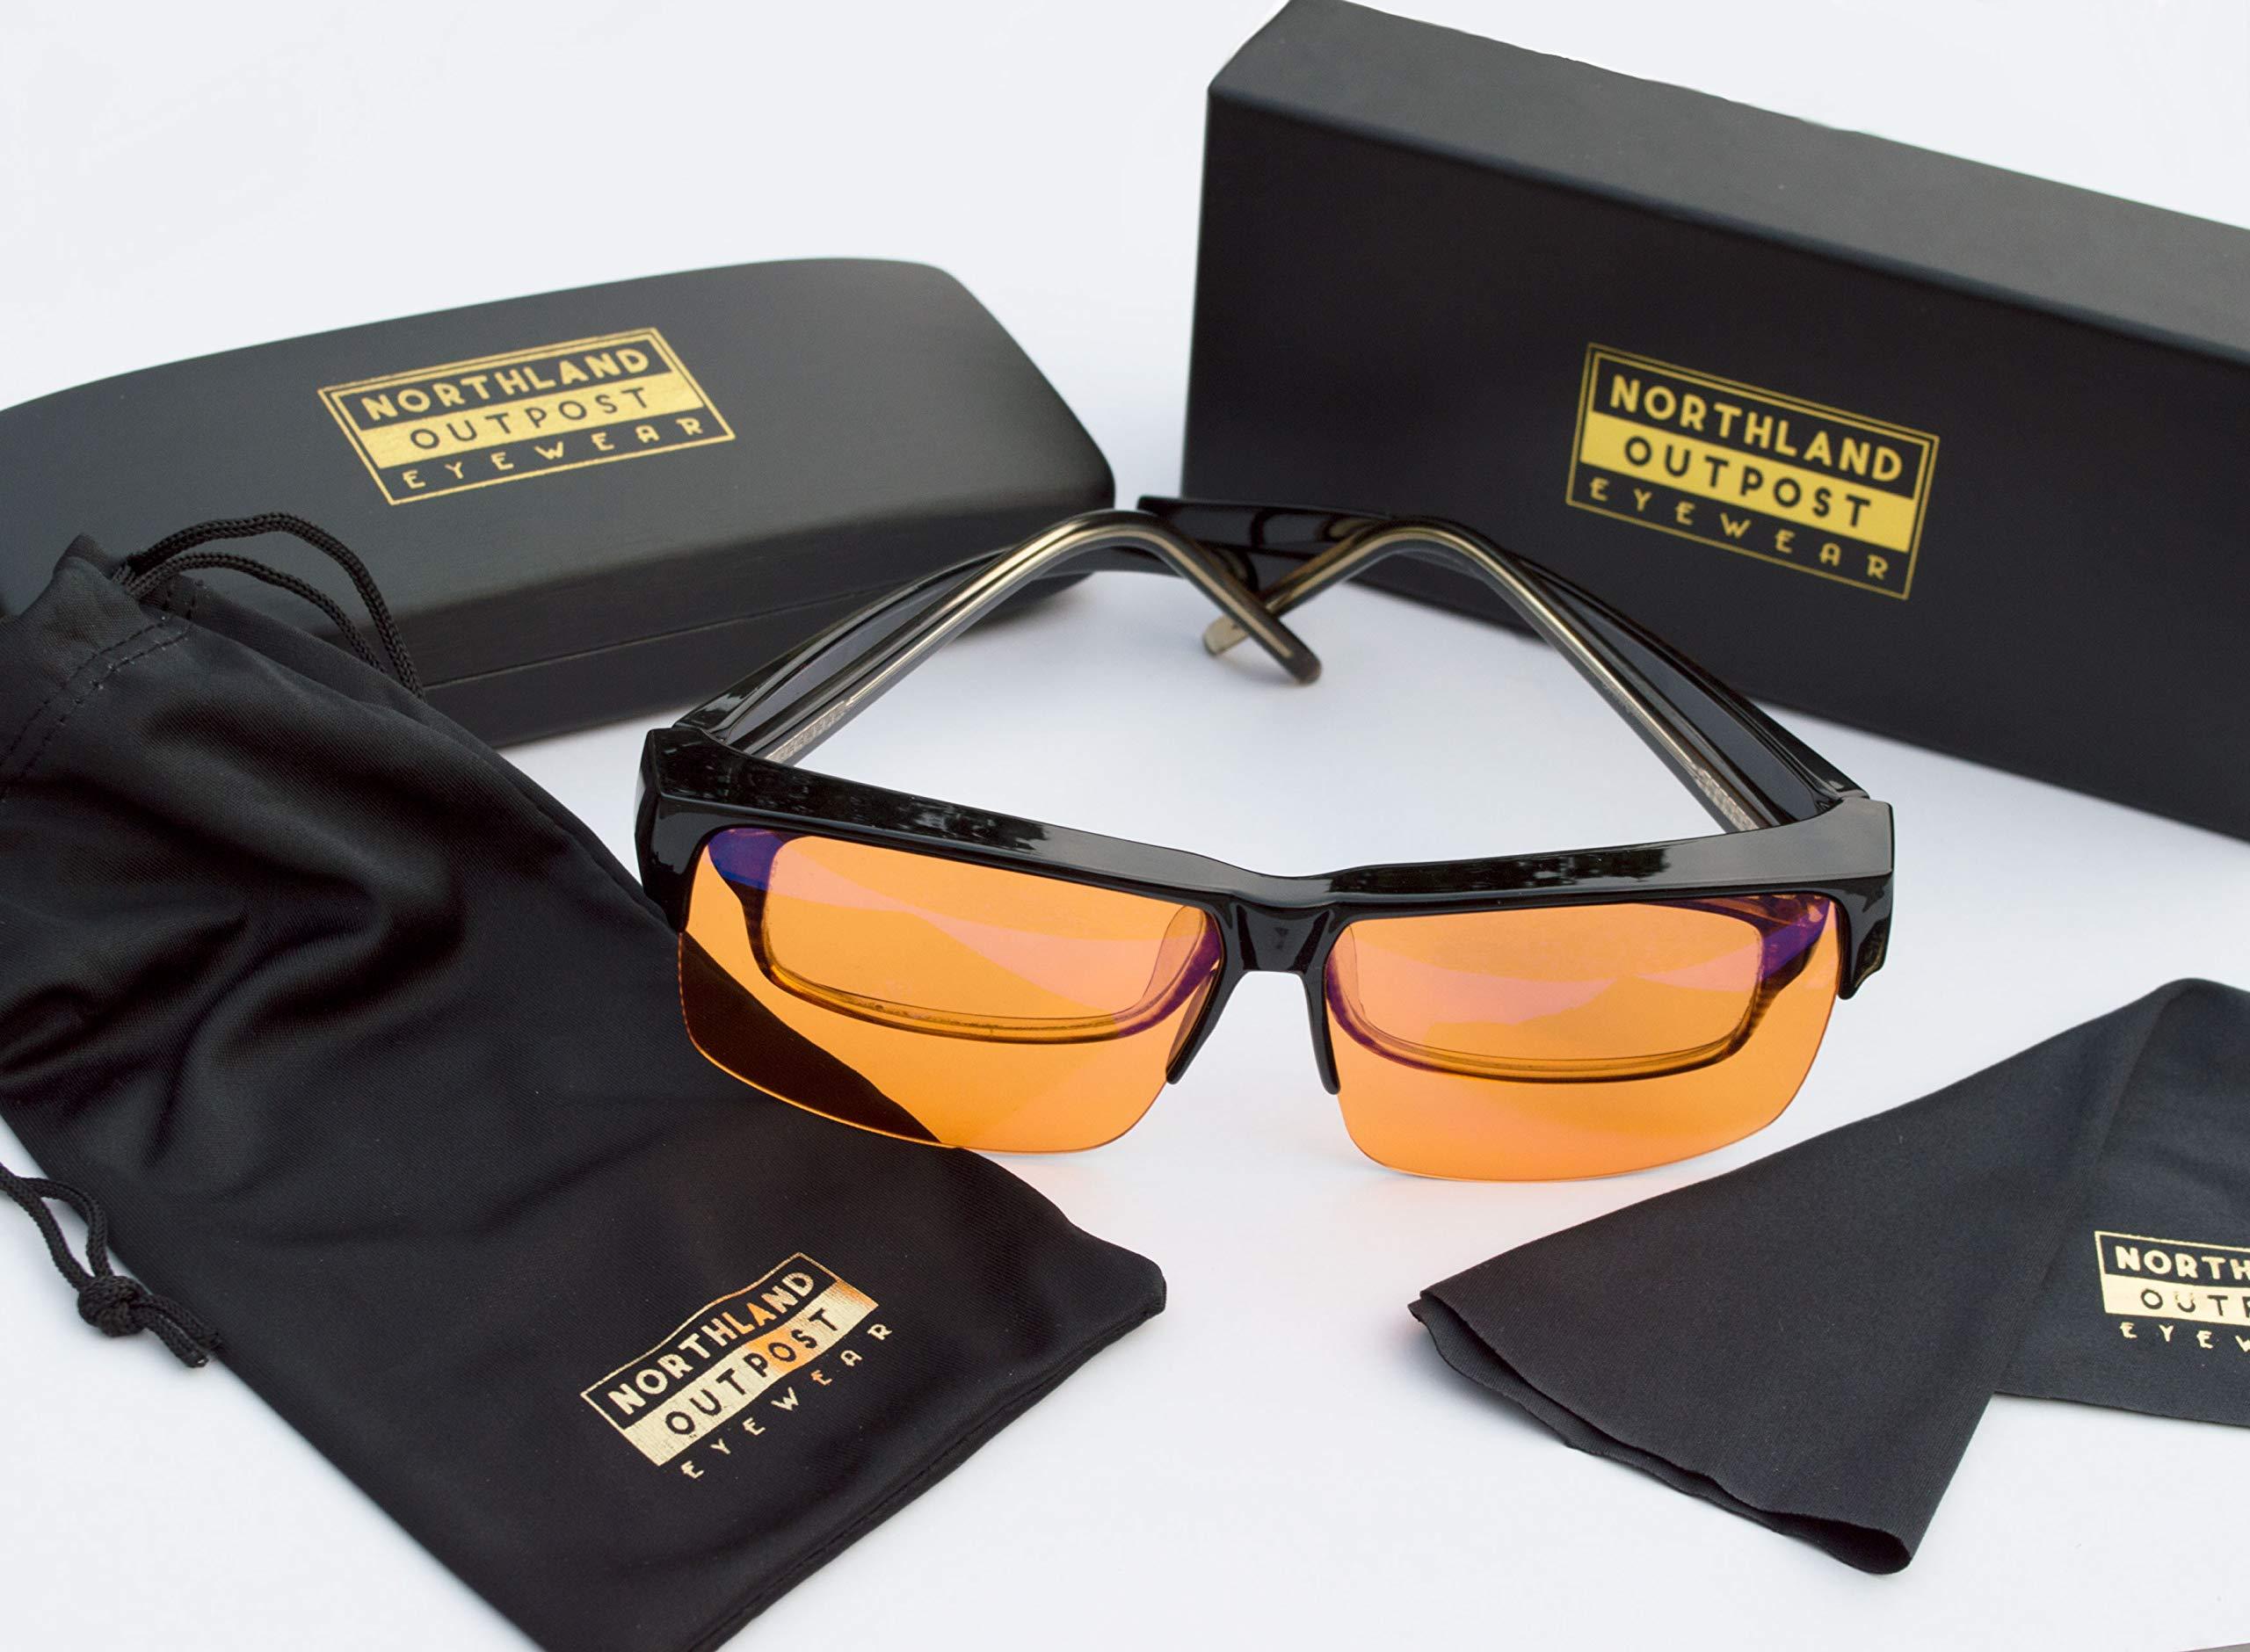 Blue Light Blocking Computer Glasses - FIT OVER Reading - To SLEEP BETTER Wear Orange Lens at Night for Insomnia - Anti Glare for Migraine, Headache, Eye Strain Relief - Men, Women, Gamer - Gaming Set